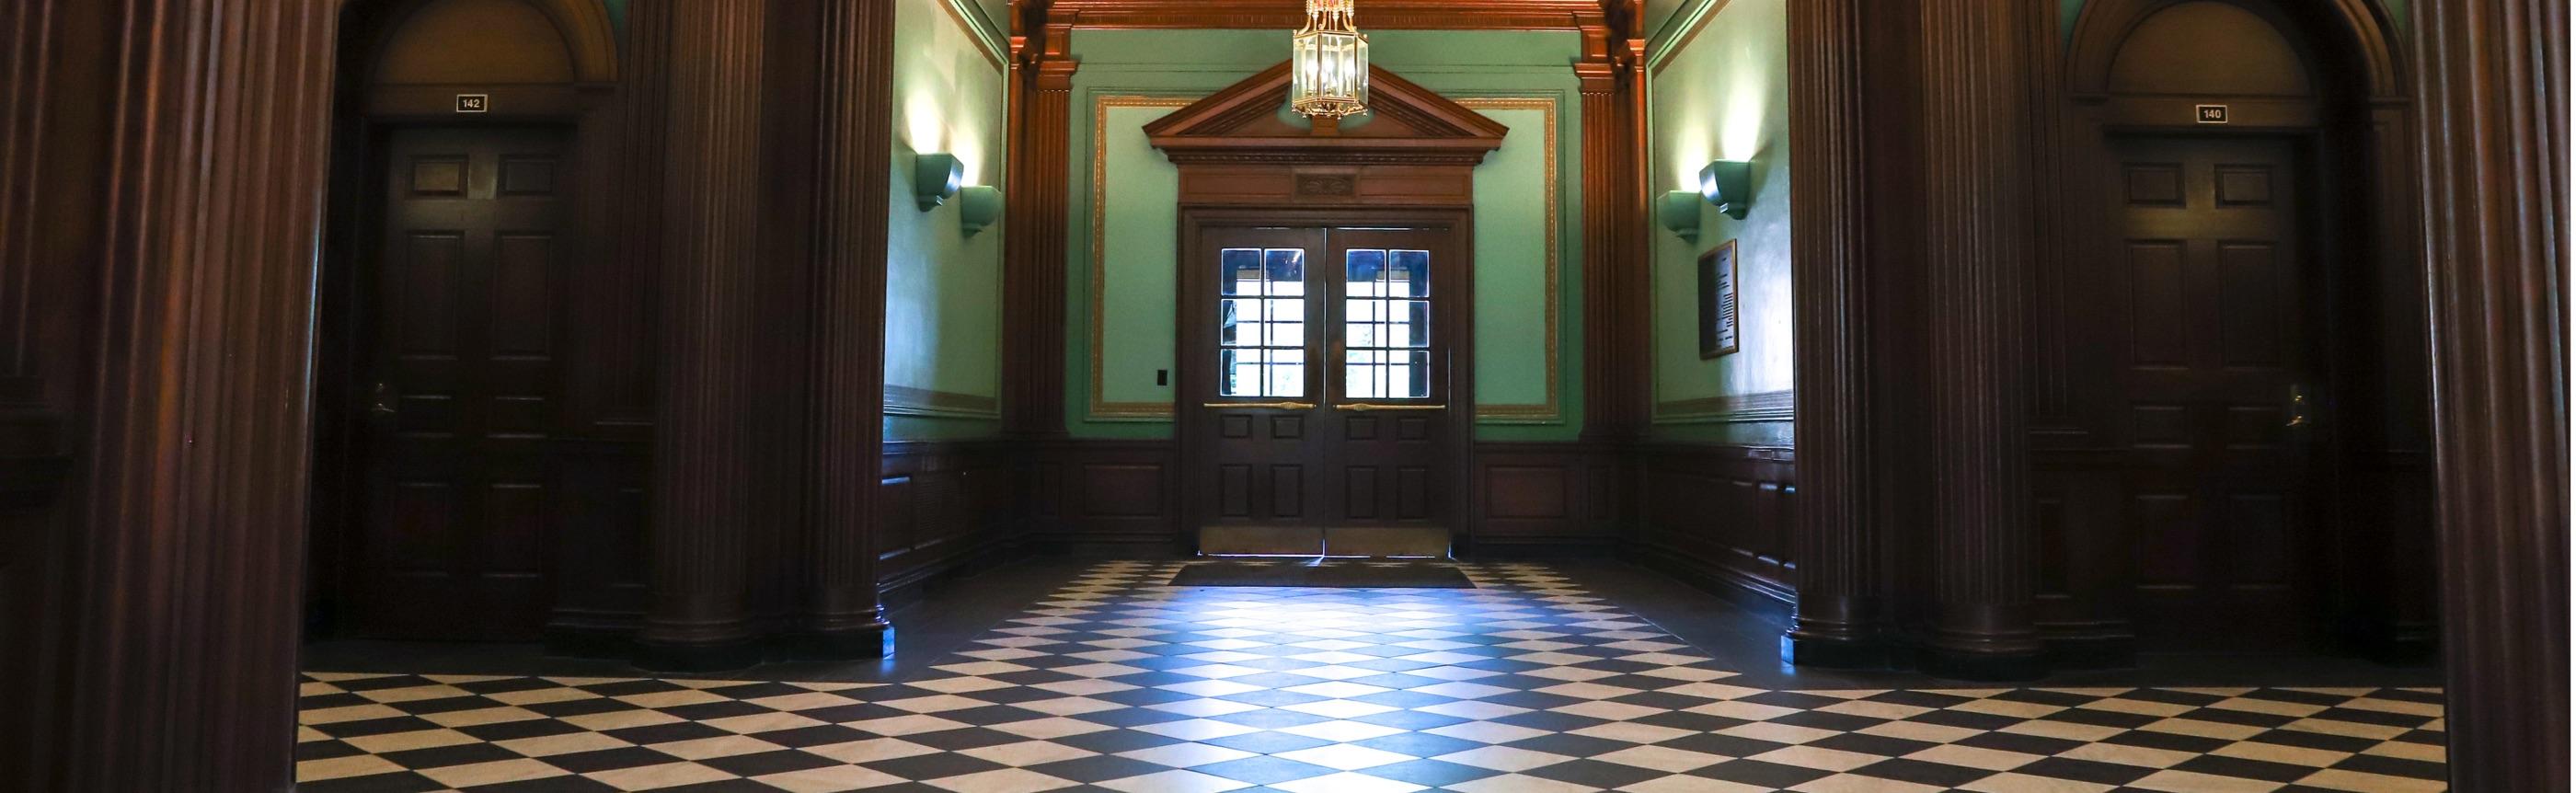 James Blair Hallway